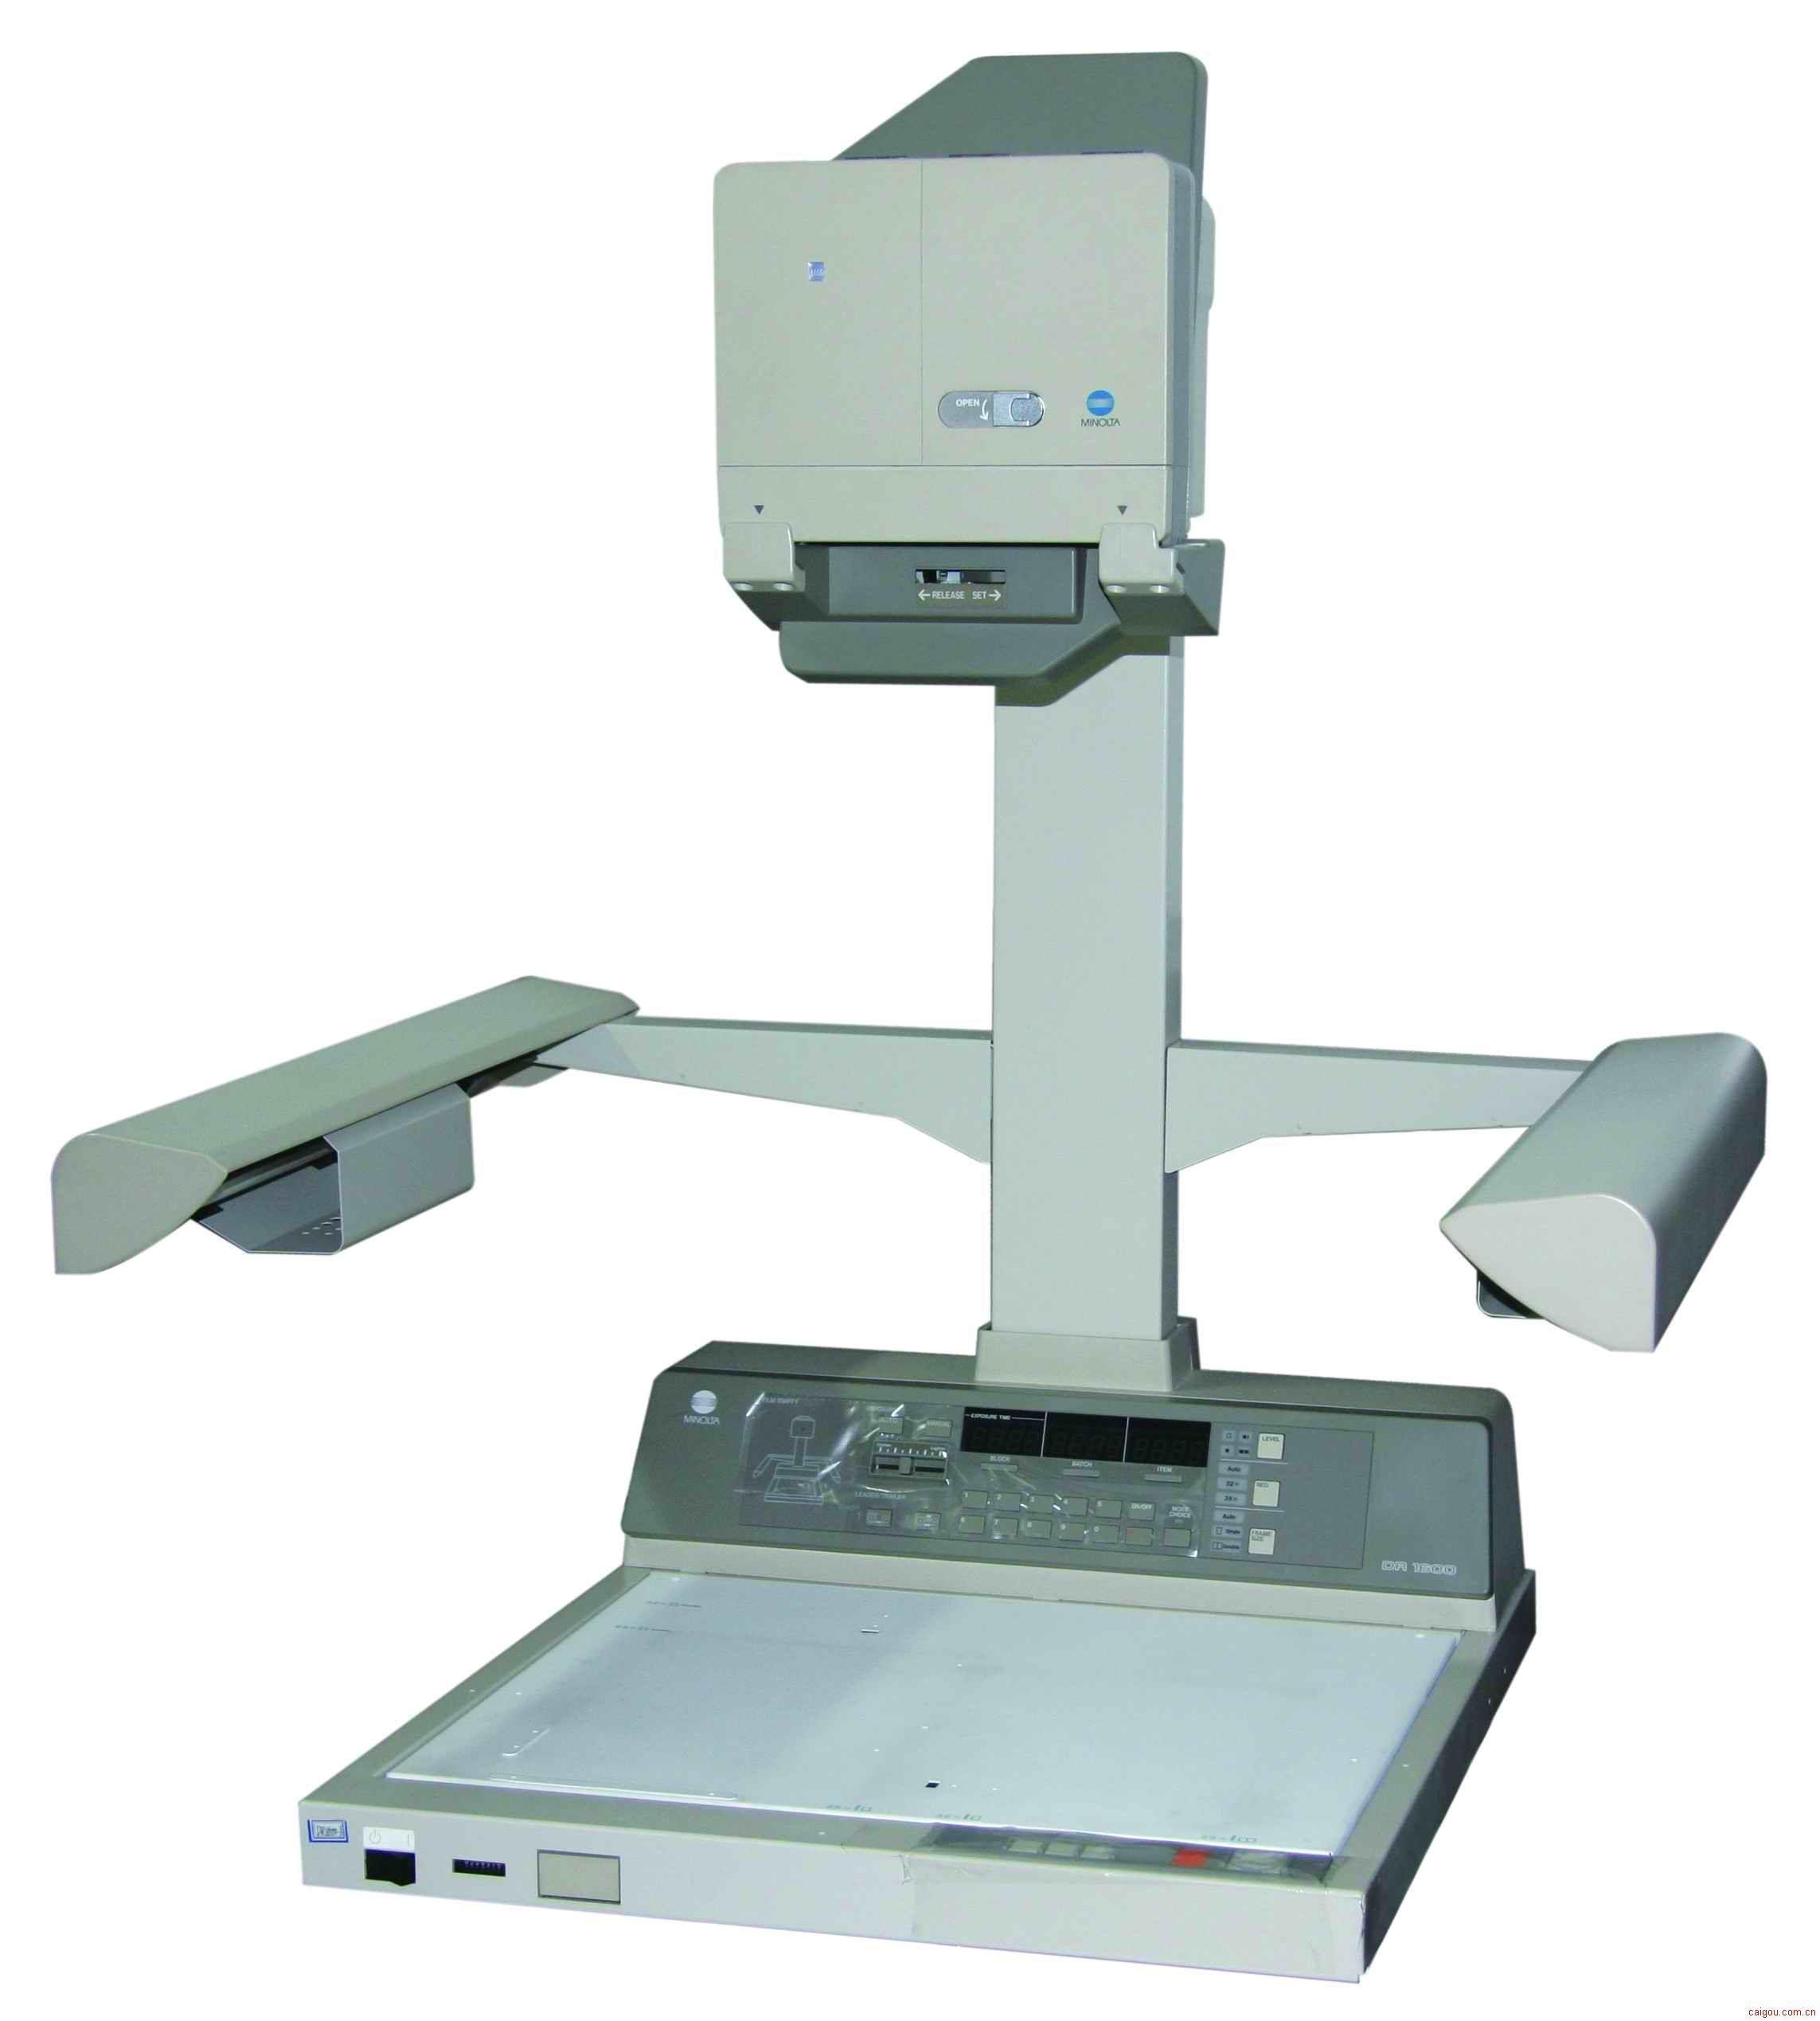 柯尼卡美能達DR1600 —16mm縮微拍攝機